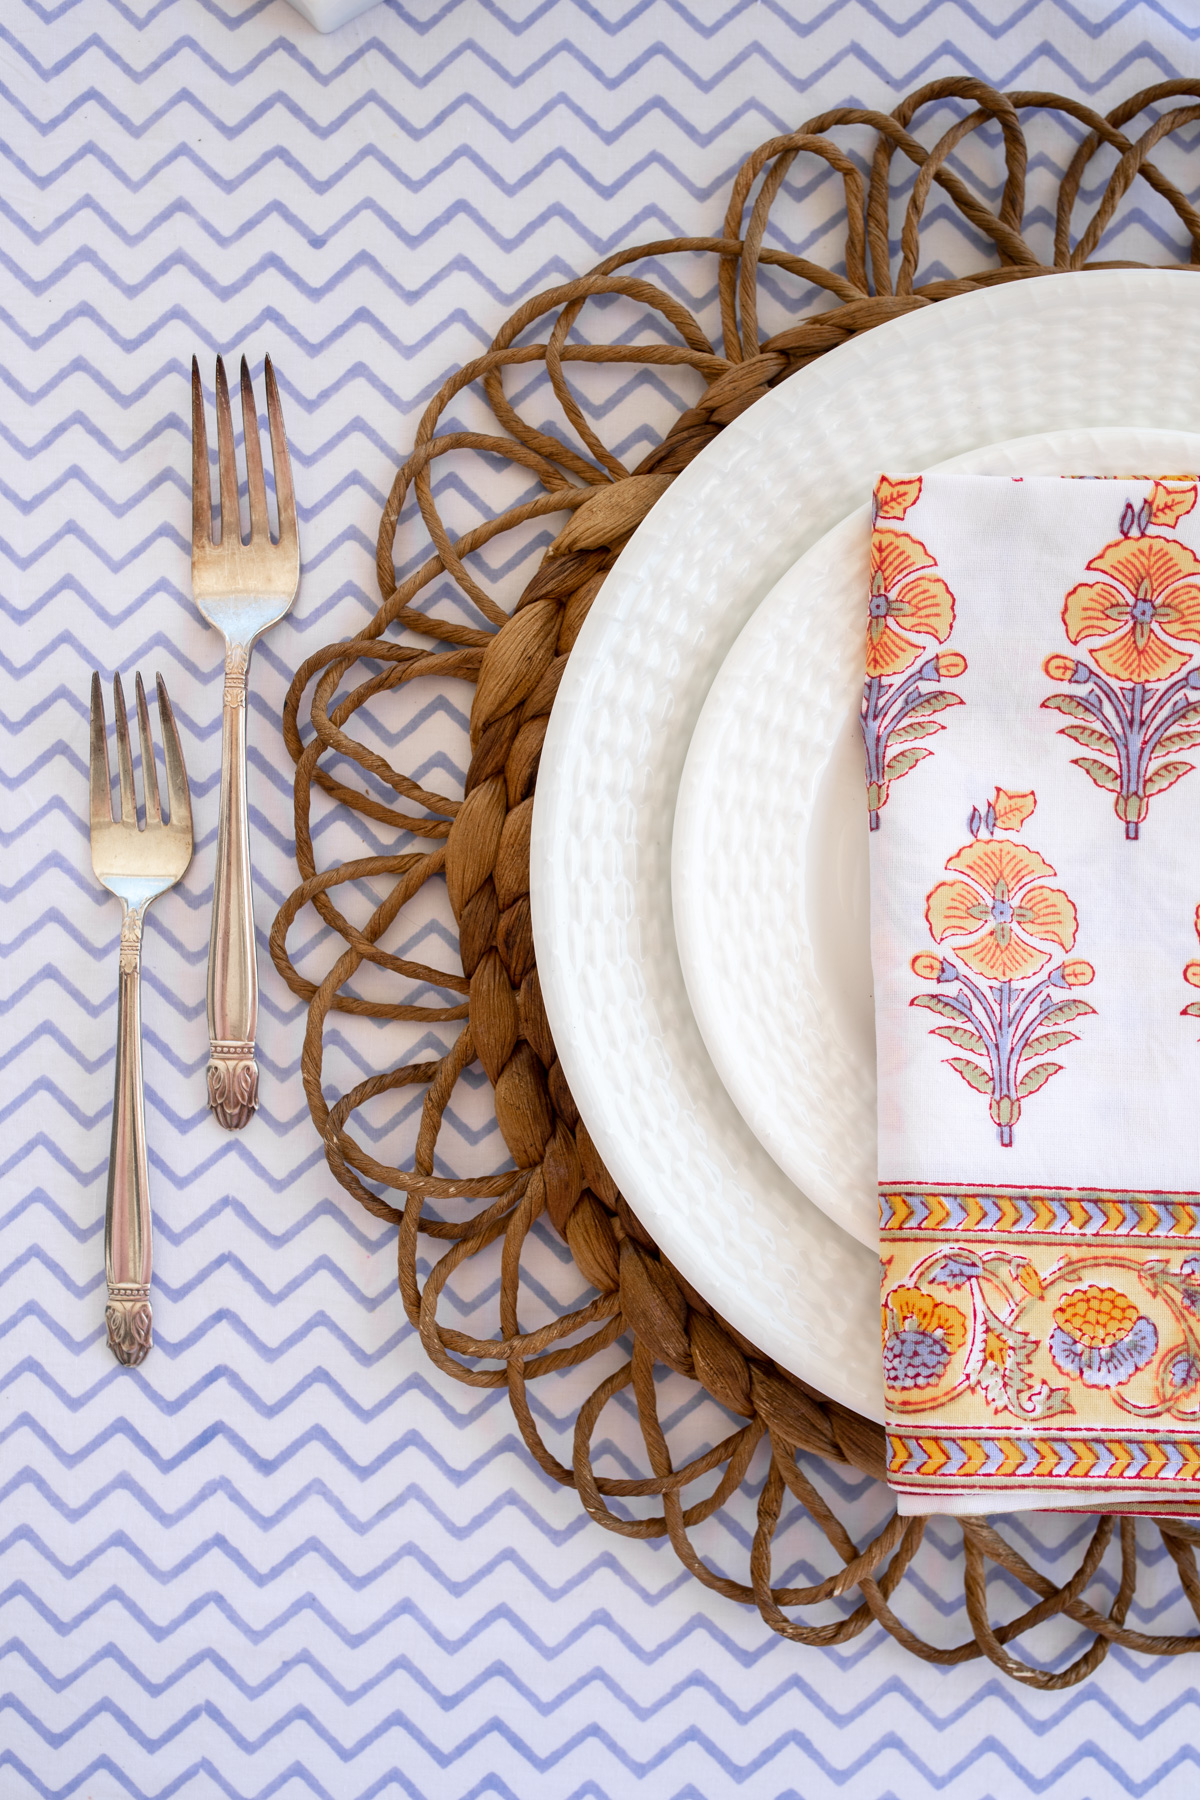 Stacie Flinner x Marigold Living Block Print Table Linens-9.jpg